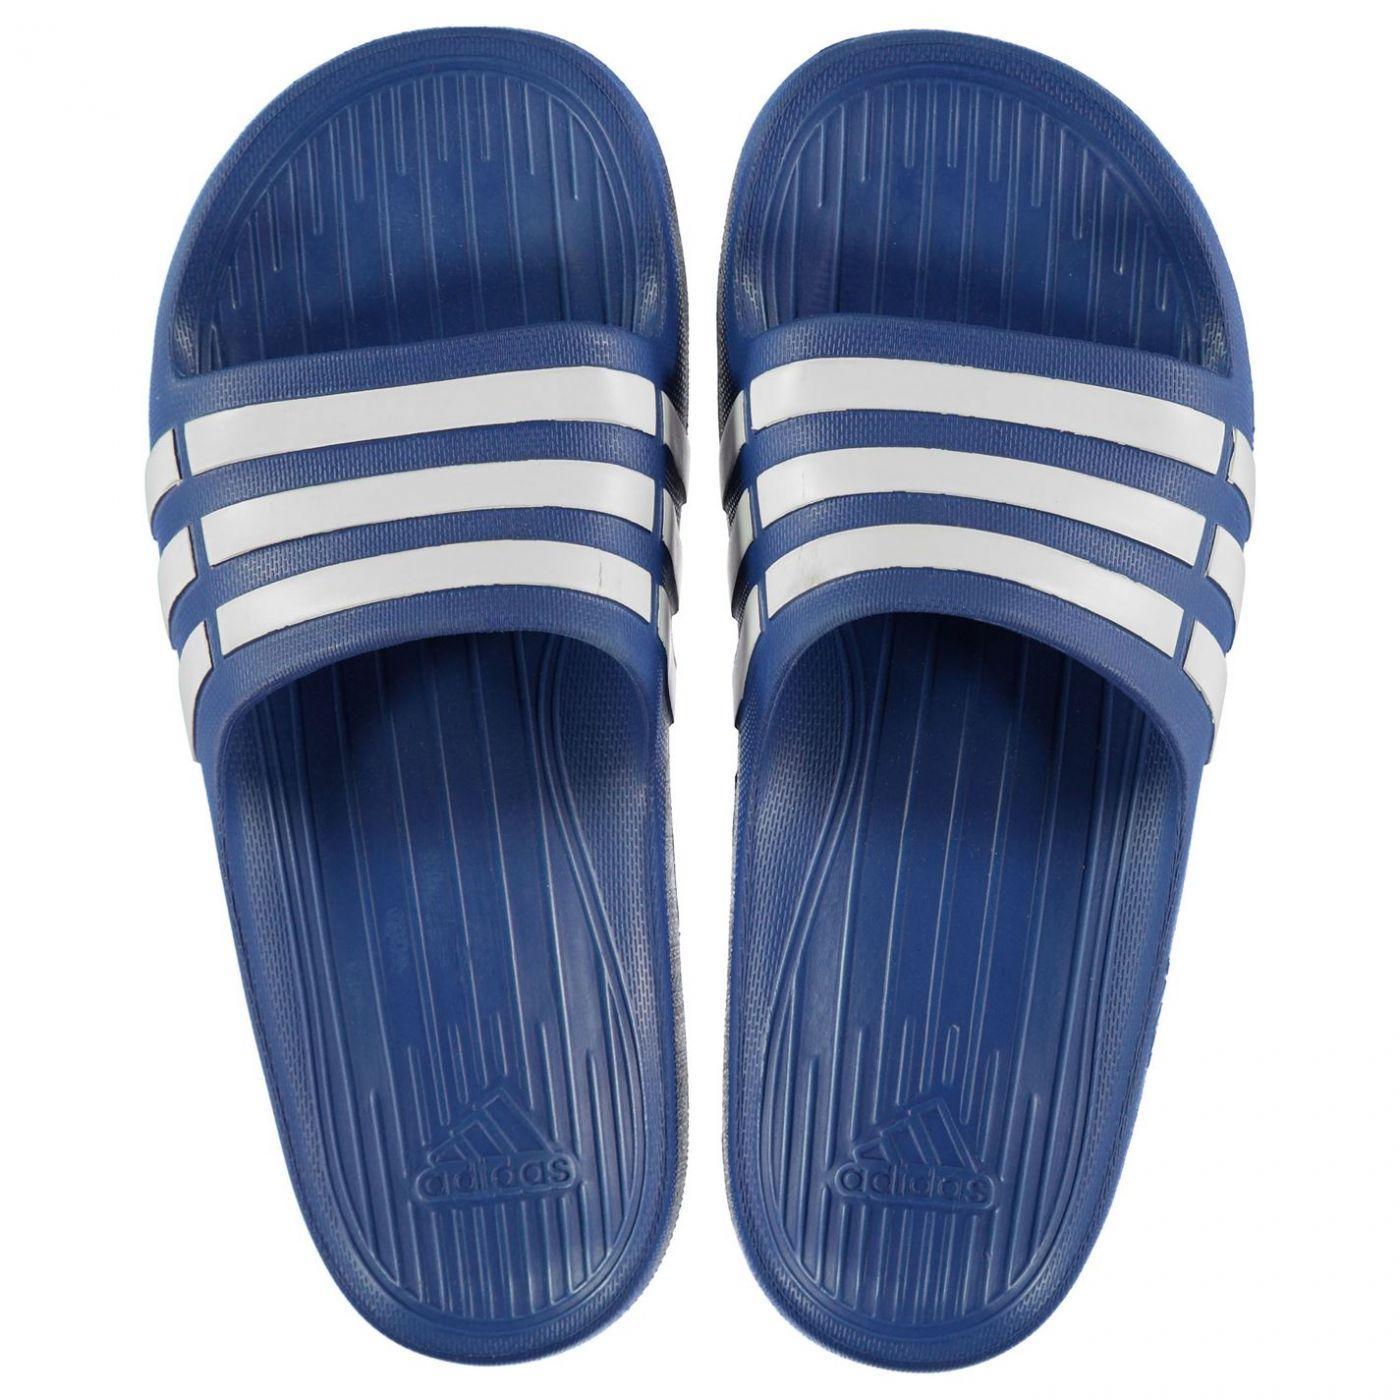 Adidas Duramo Junior Sliders